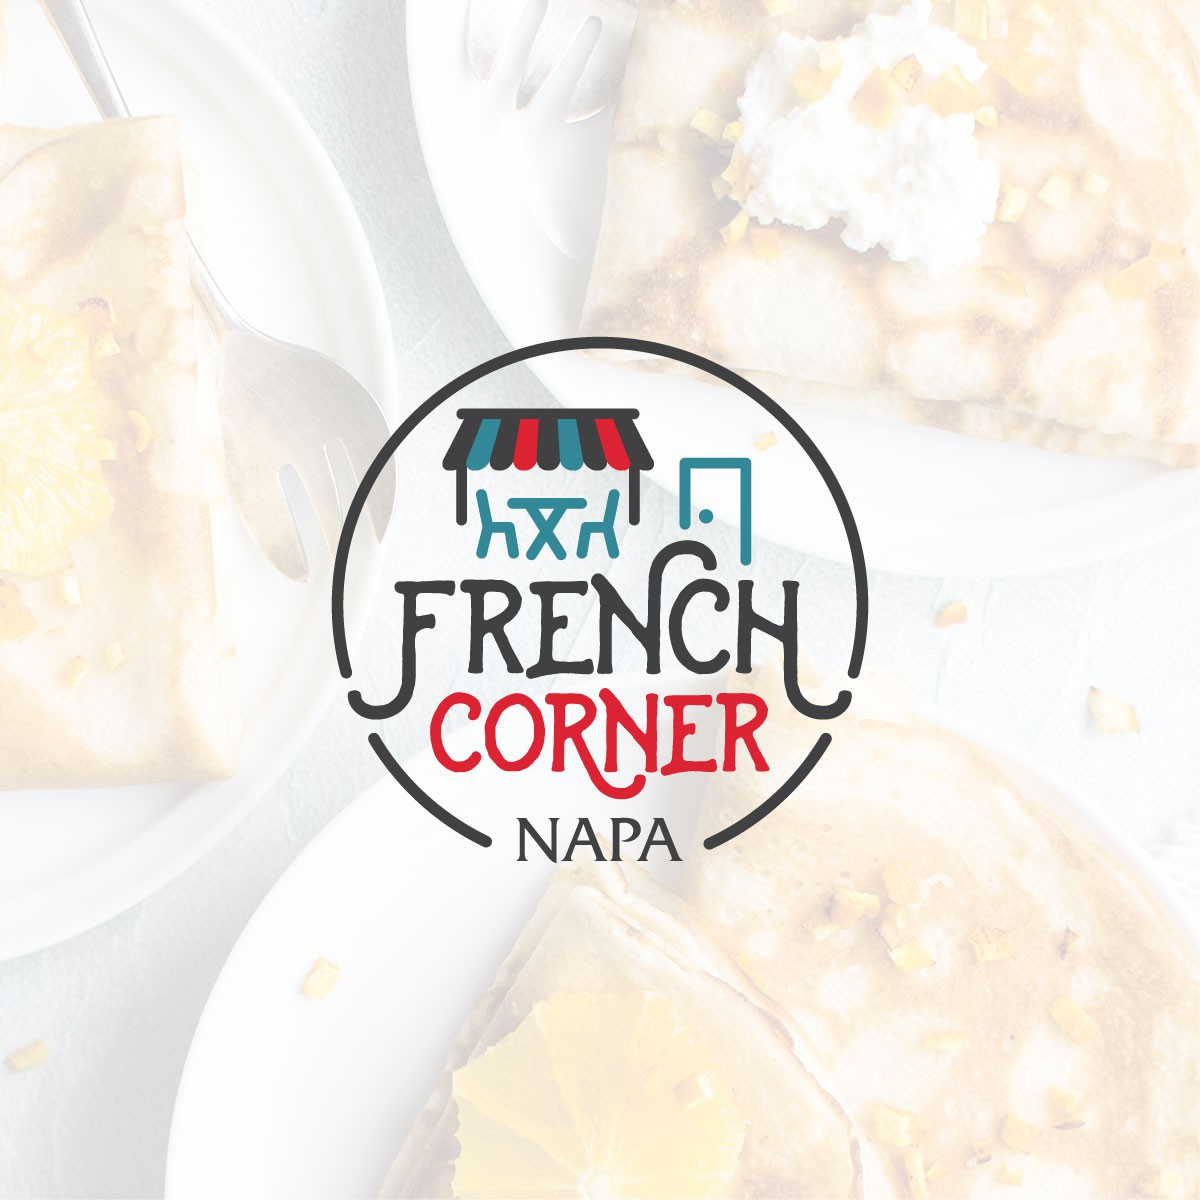 French Corner